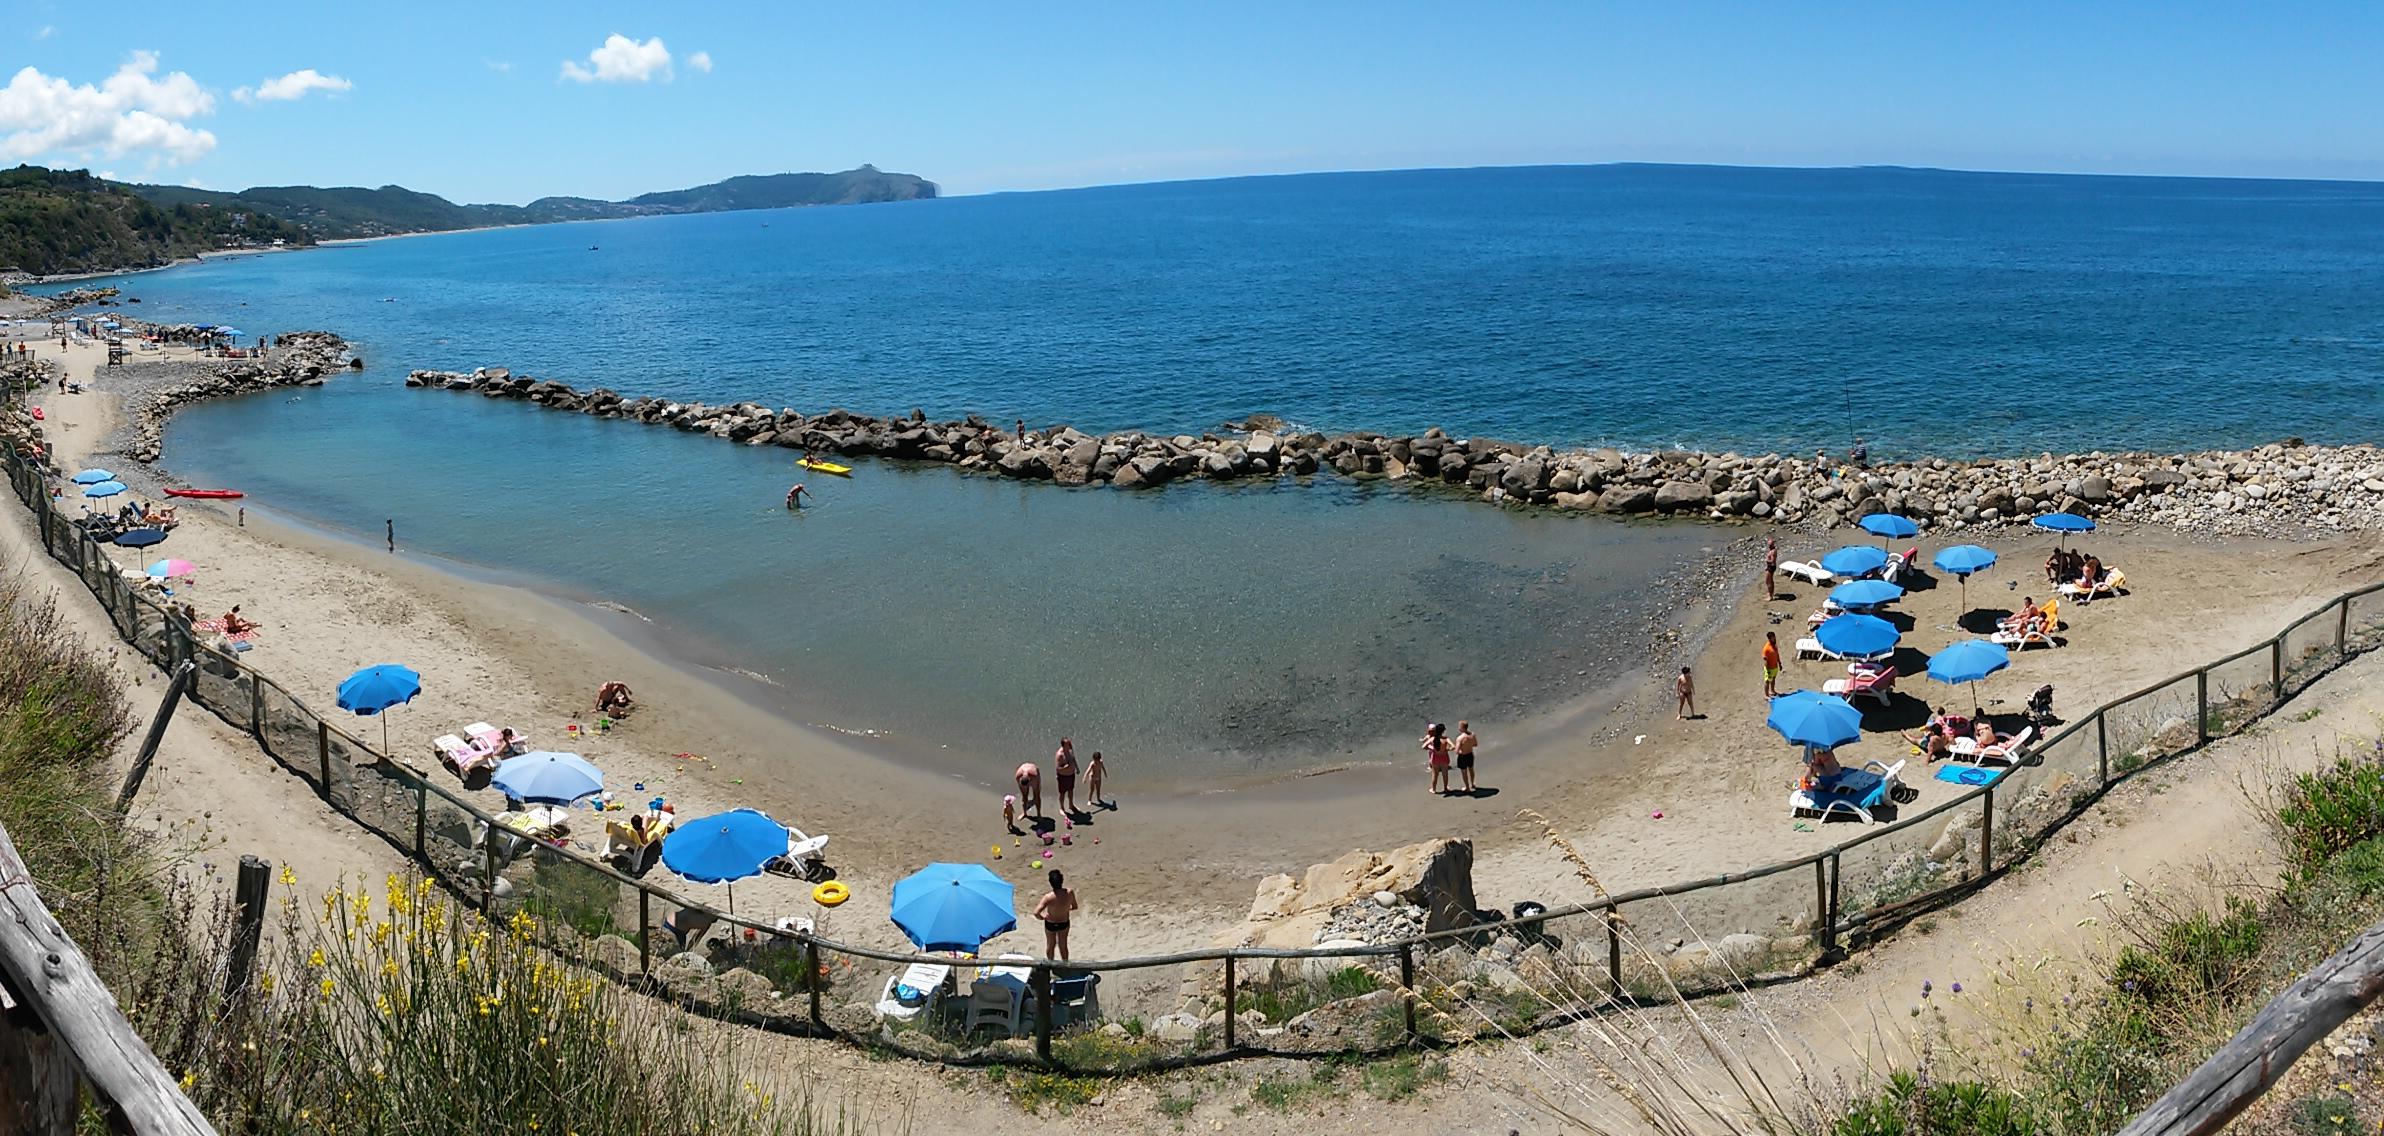 Caprioli beach